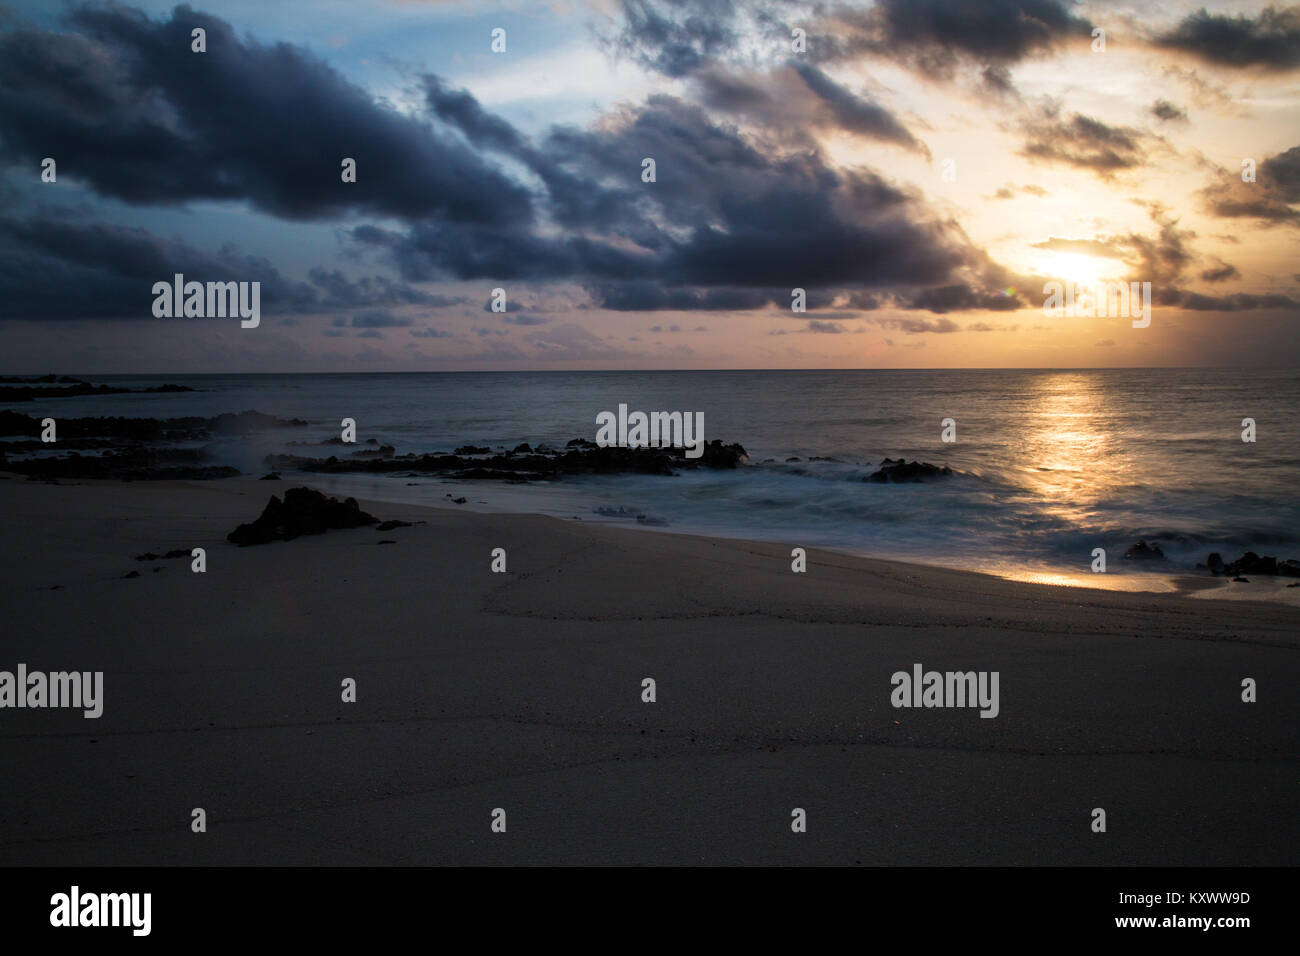 Ascension Island - Stock Image